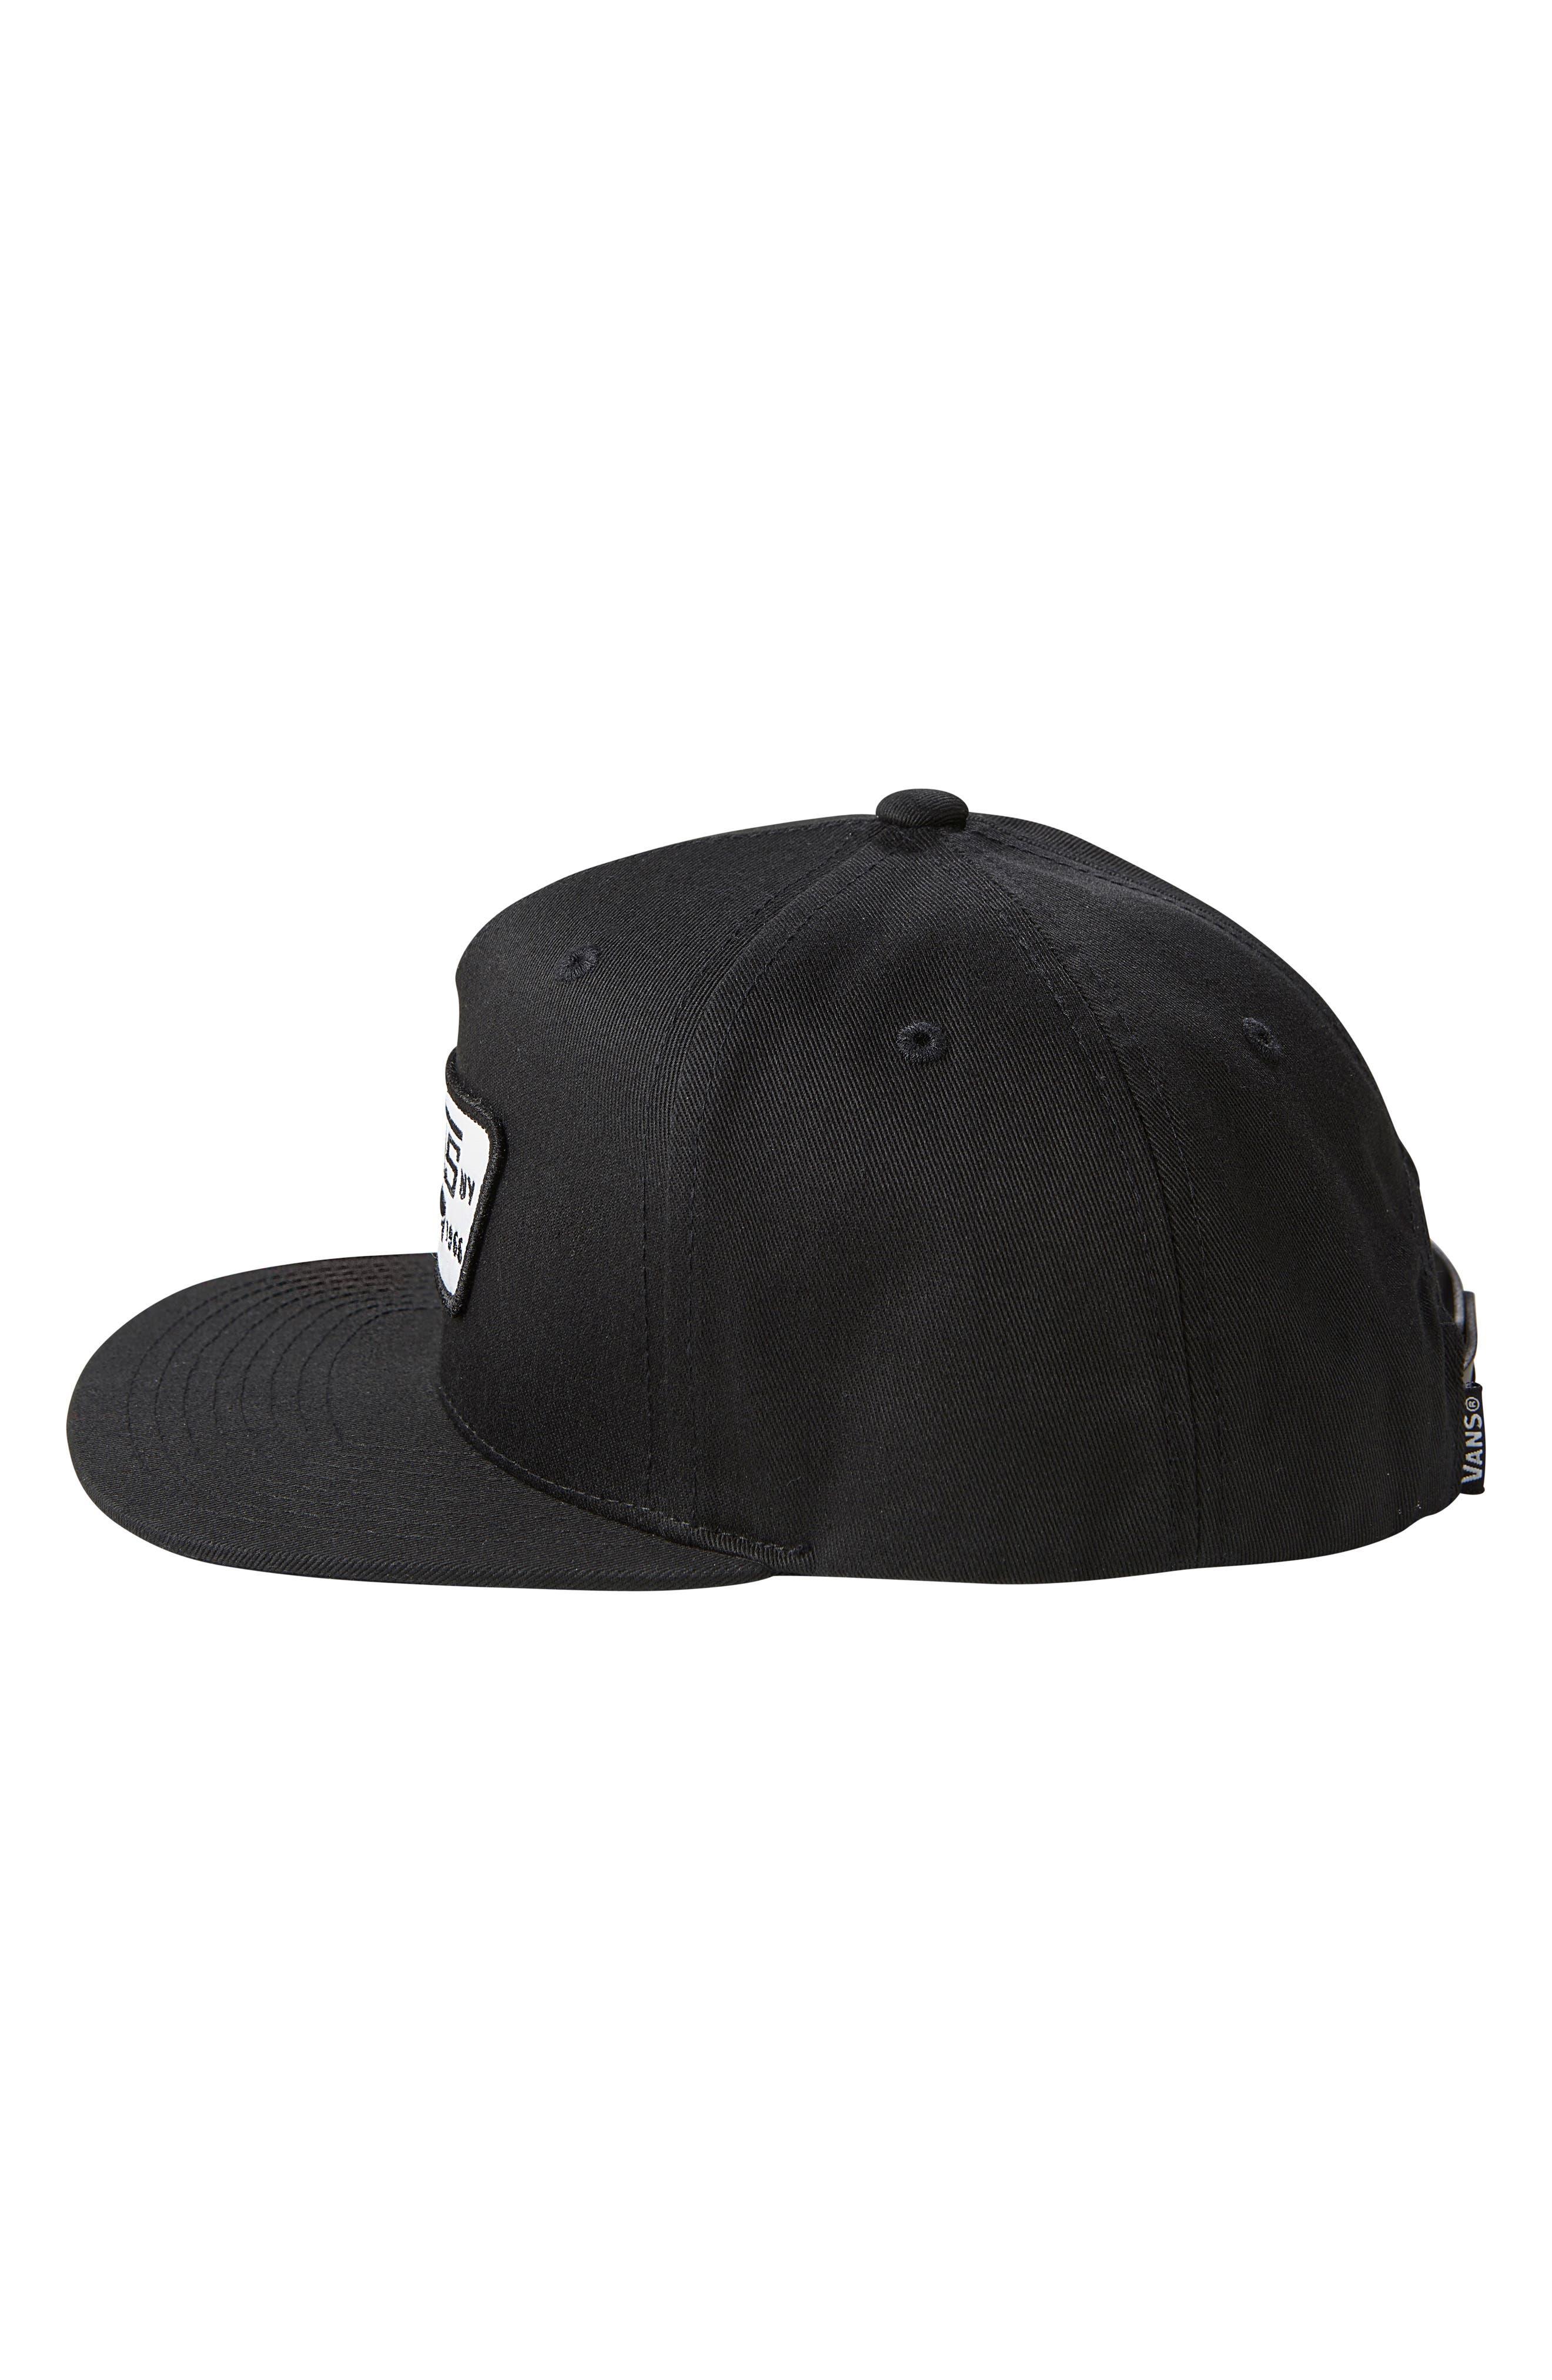 Boys Vans Full Patch Snapback Hat  Black